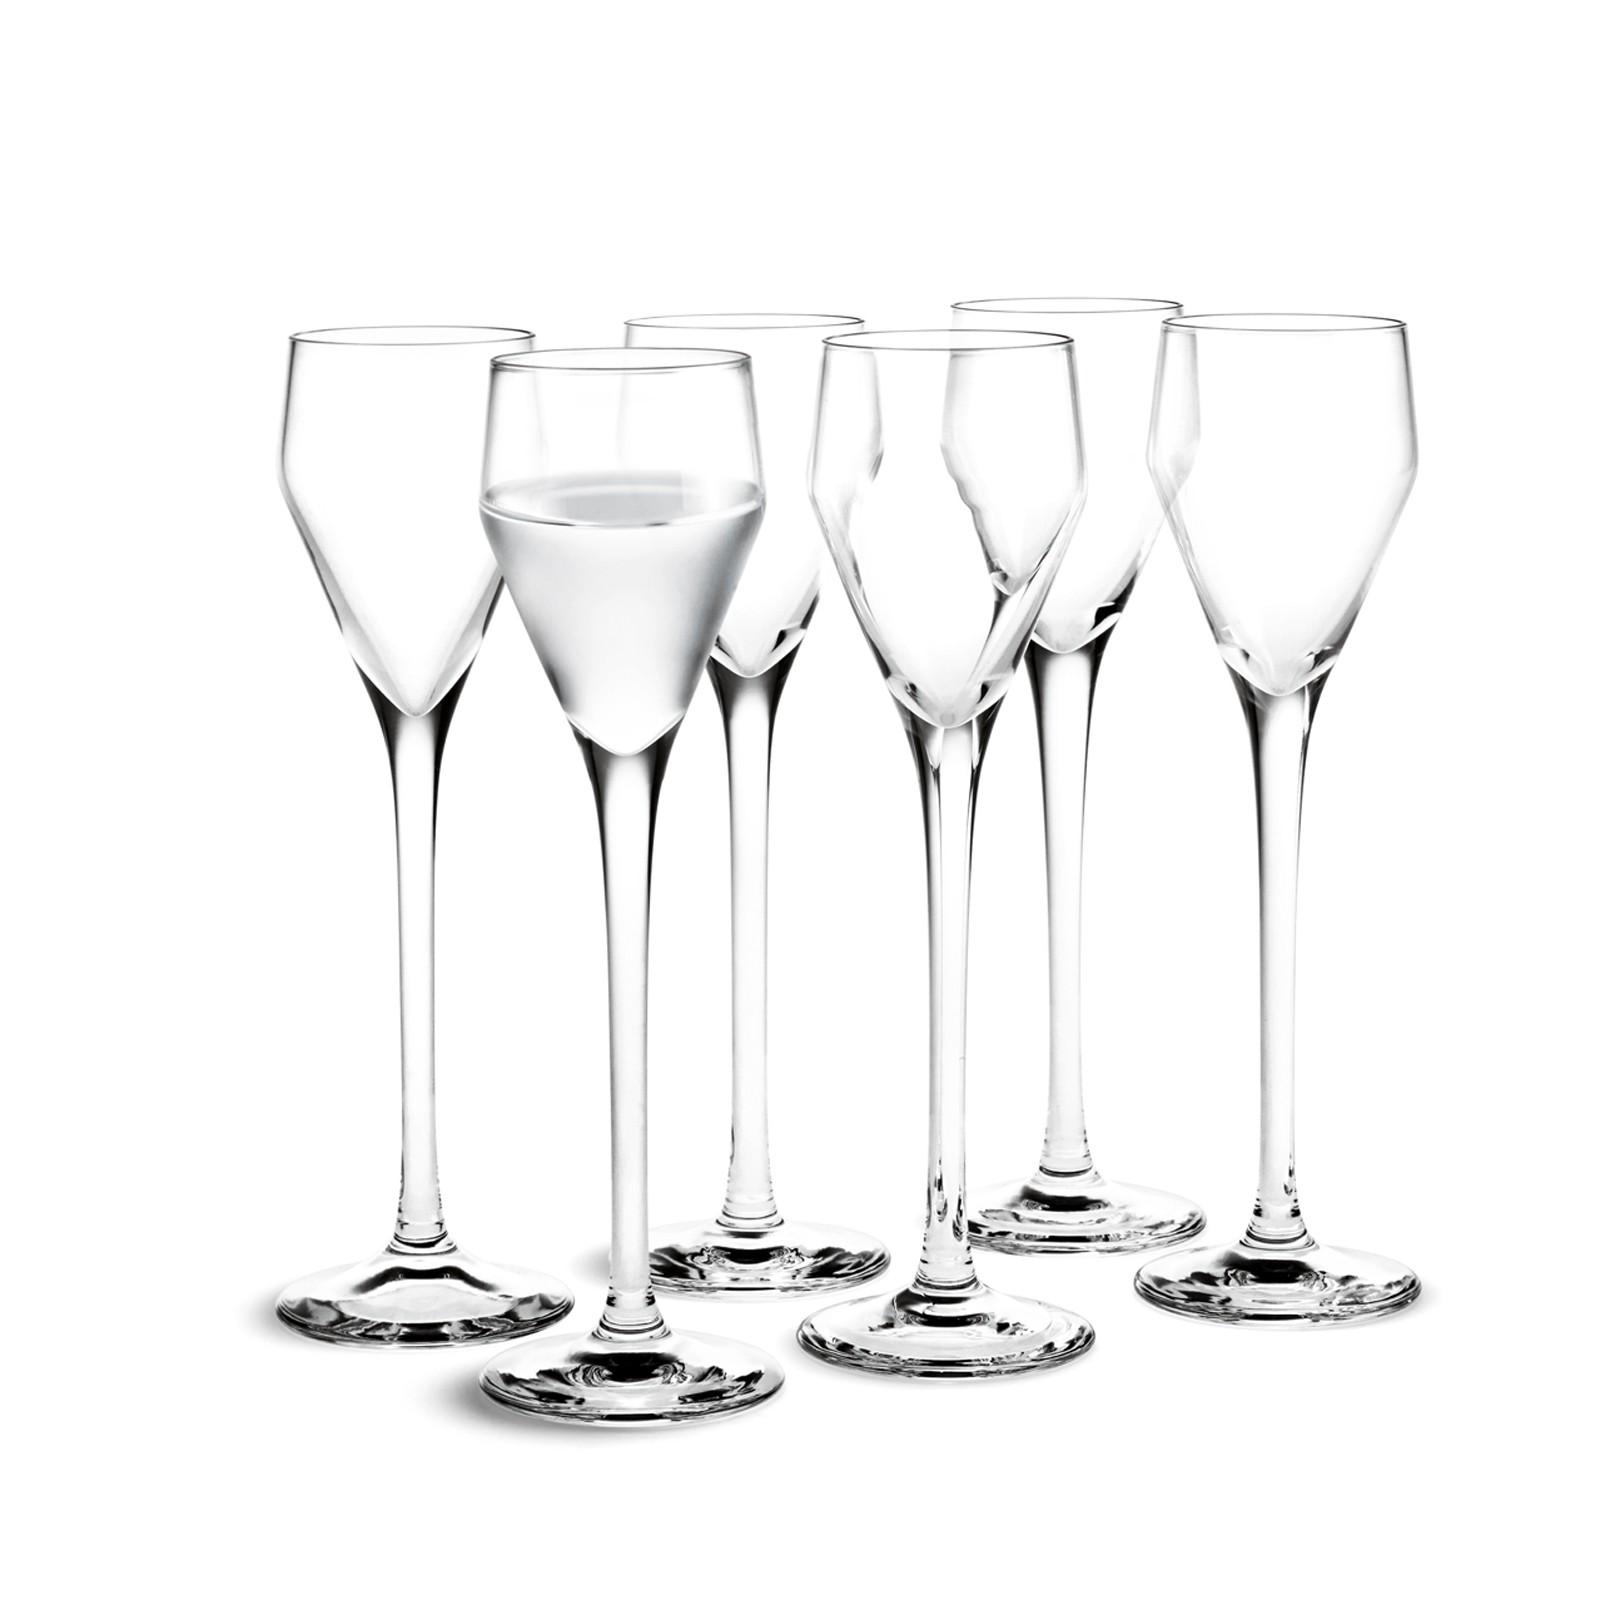 Holmegaard Perfection Schnapsglas 6 Stück 5,5 cl Design Tom Nybroe